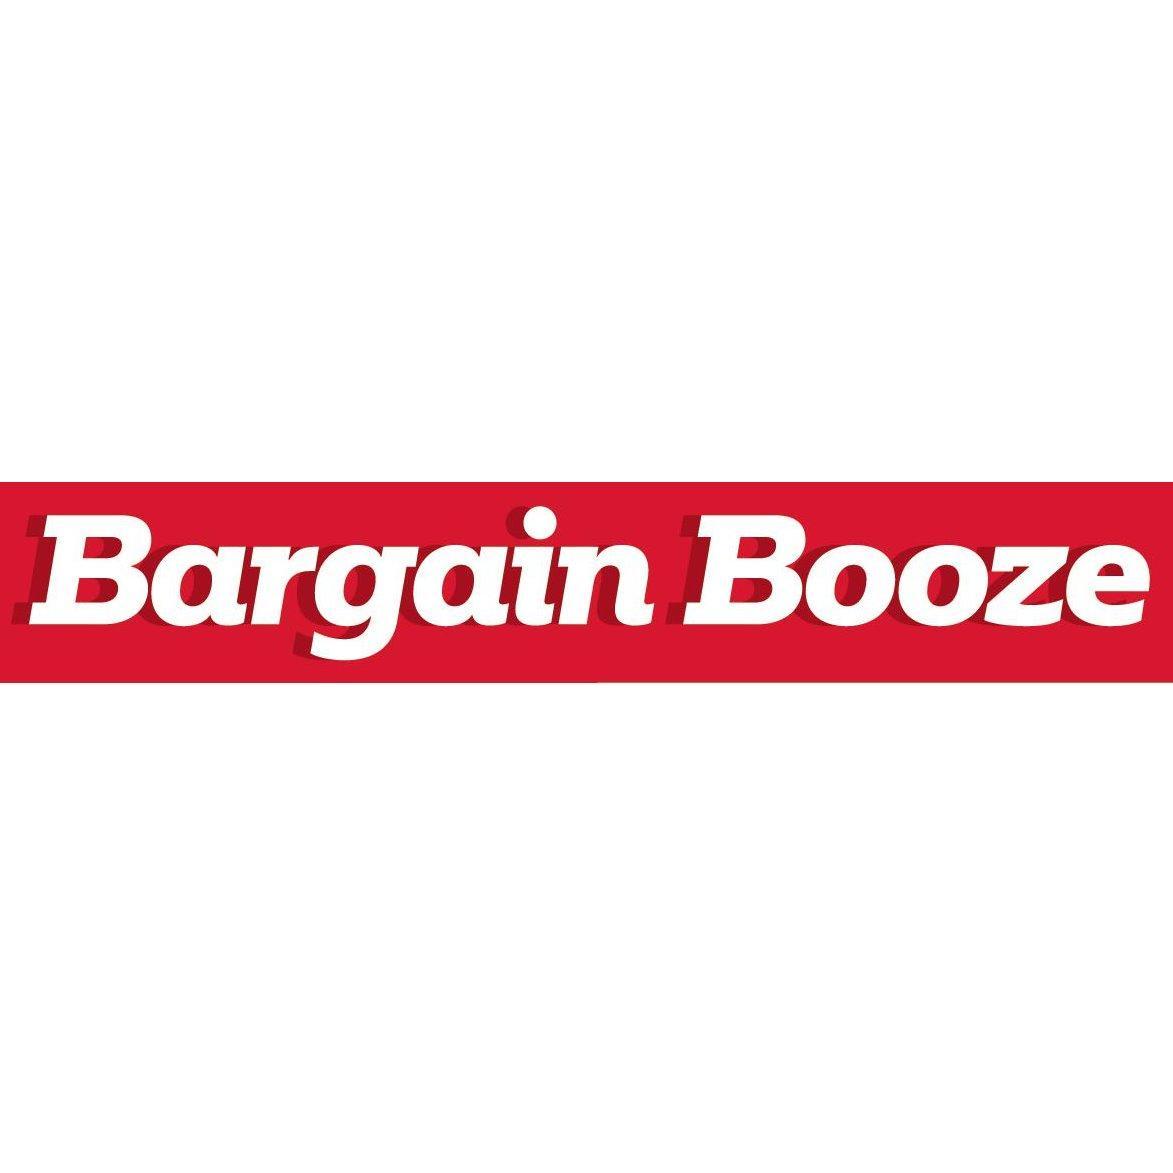 Bargain Booze - Southport, Merseyside PR9 7BJ - 01704 225323 | ShowMeLocal.com